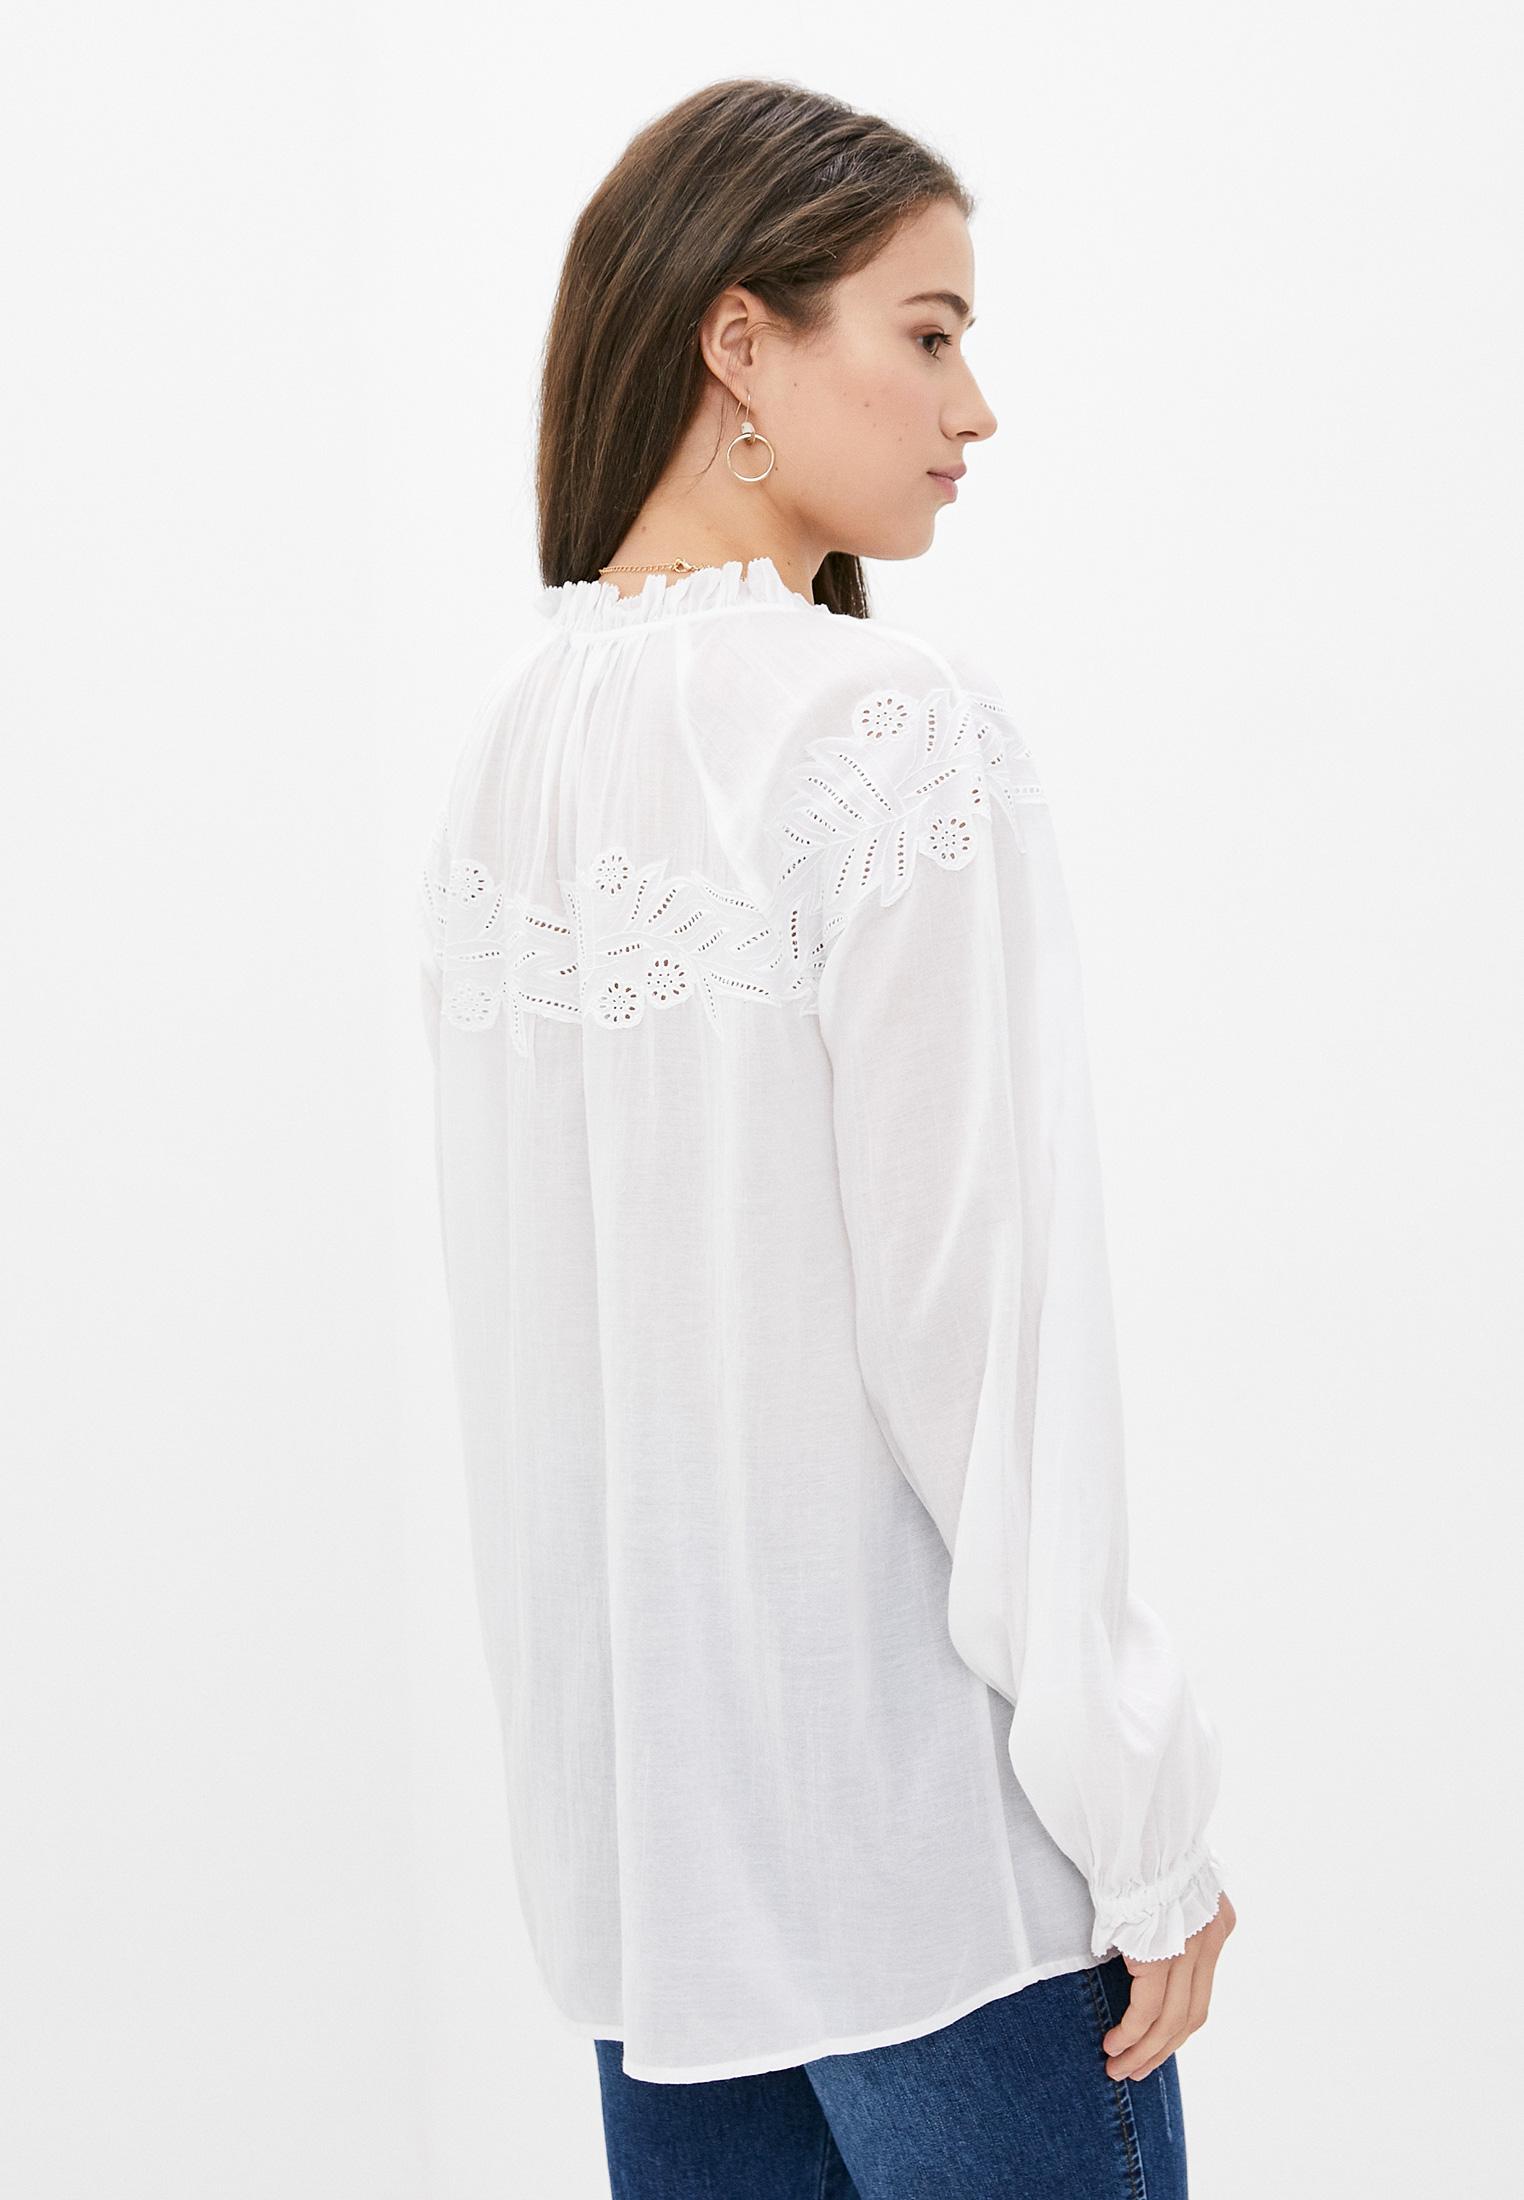 Блуза Tommy Hilfiger (Томми Хилфигер) WW0WW28162: изображение 3